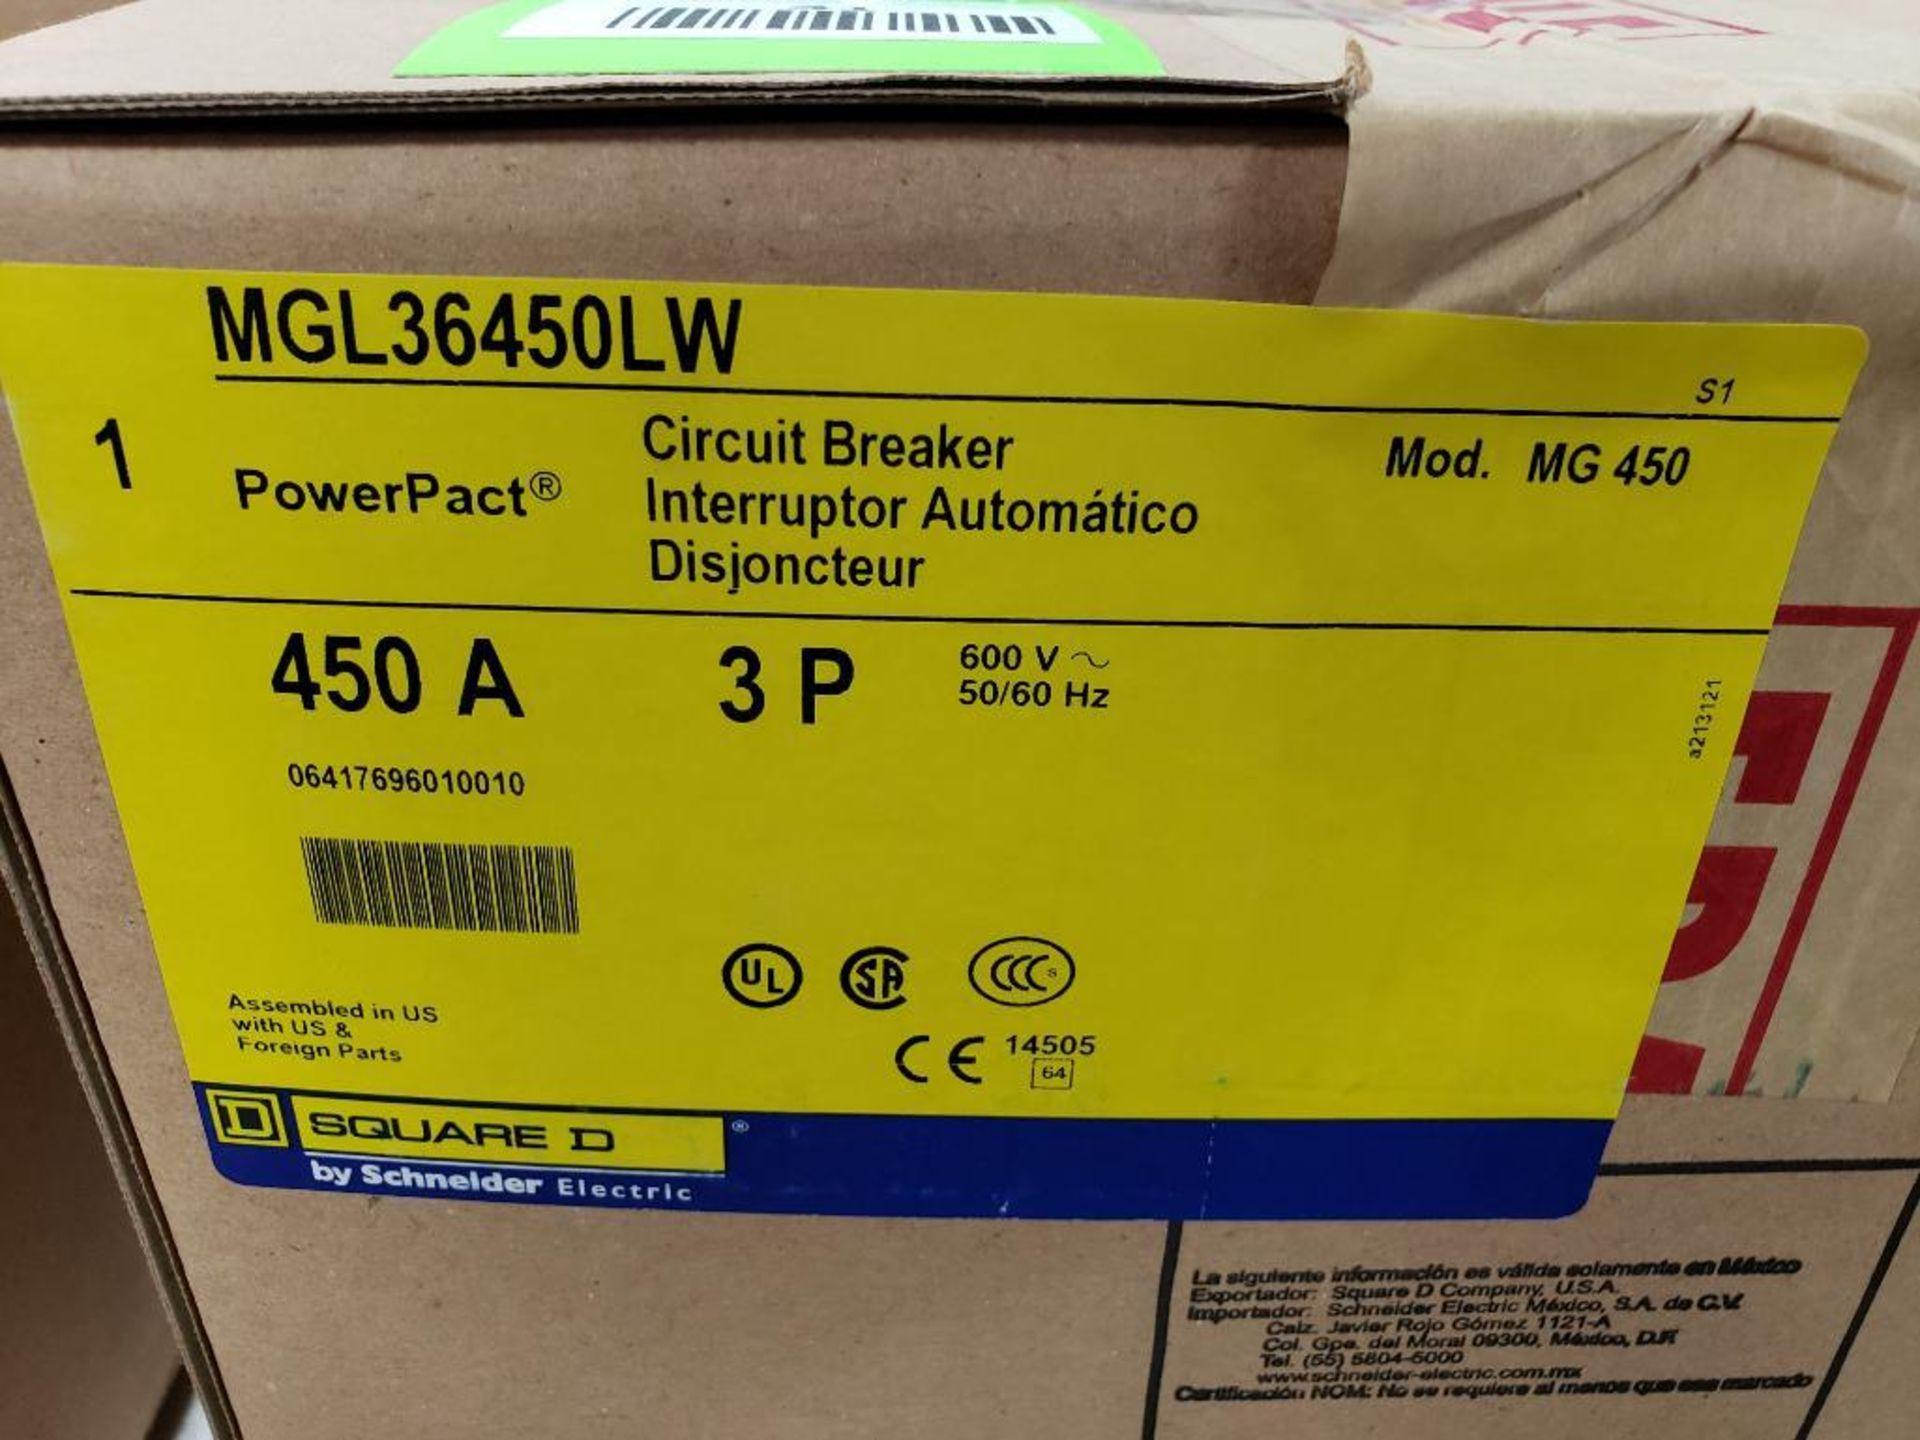 Square D PowerPact breaker. 450 amp 3 phase. Model MGL36450LW. New in box. (minor shelf wear) - Image 3 of 3